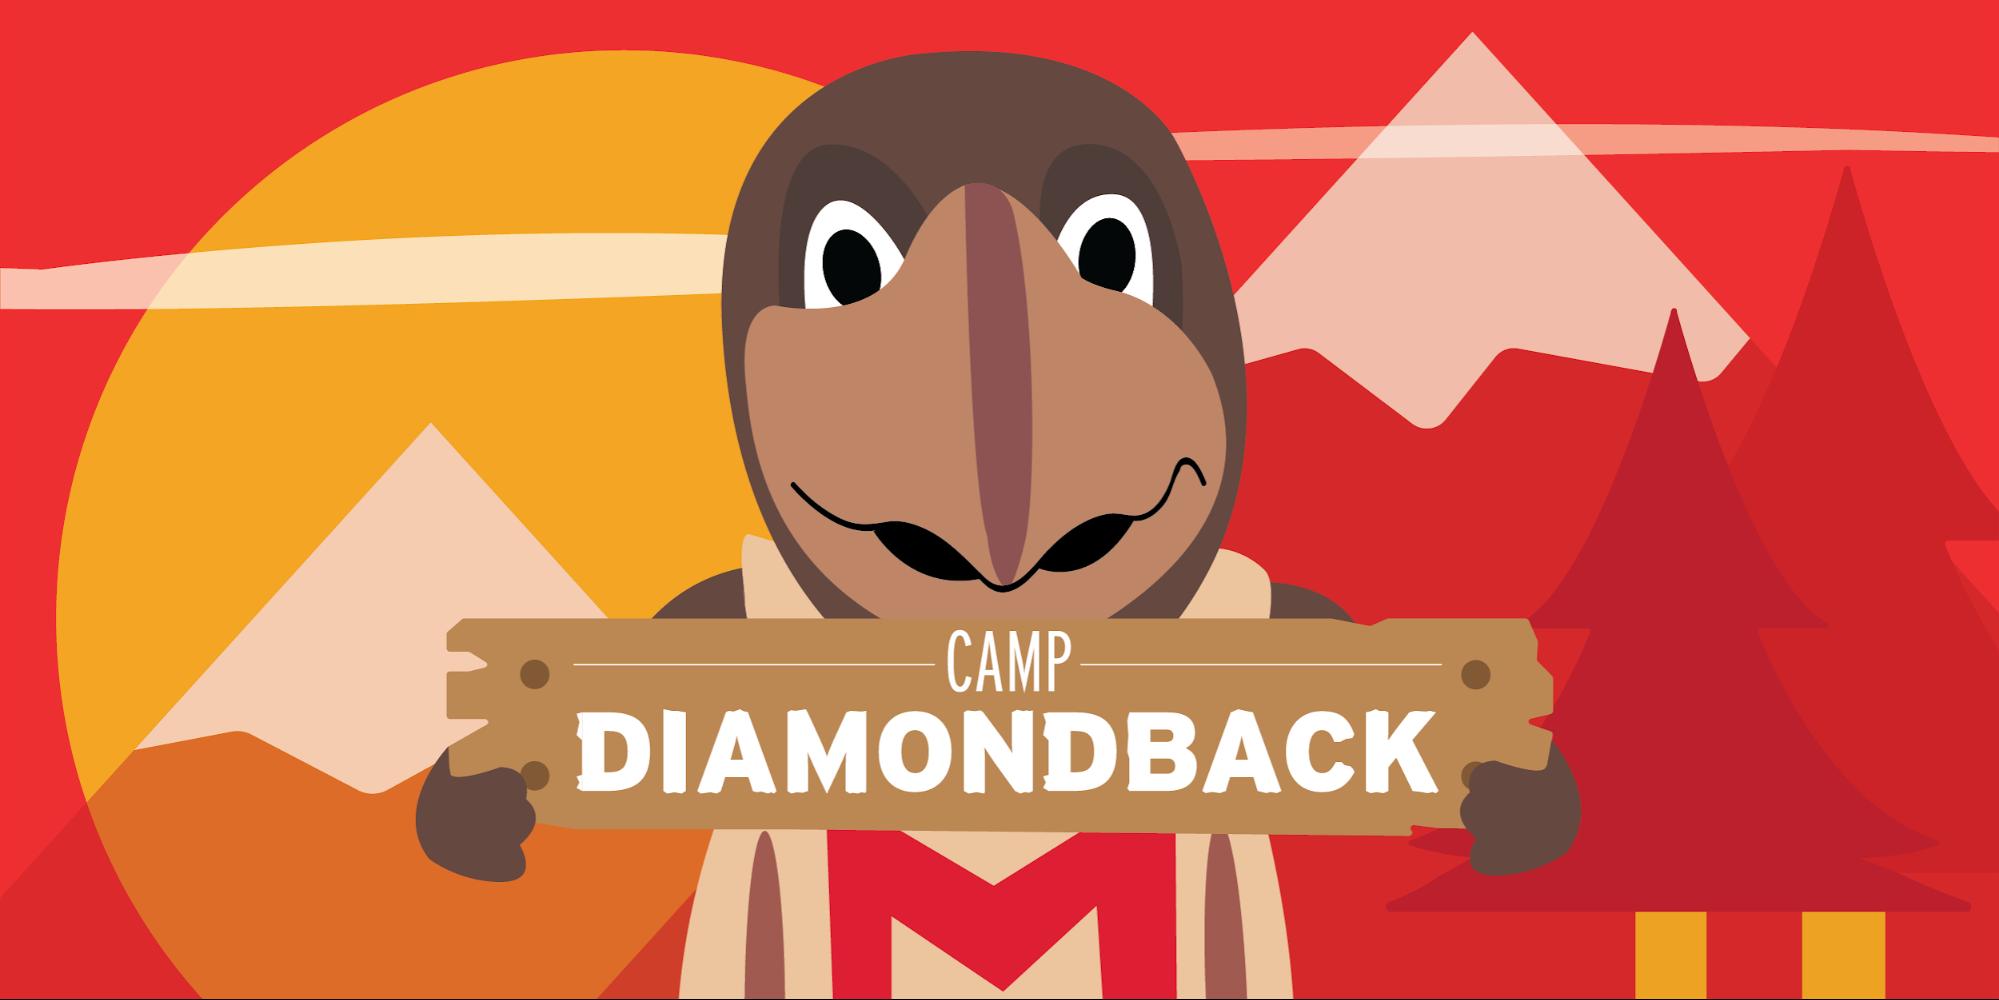 Camp Diamondback